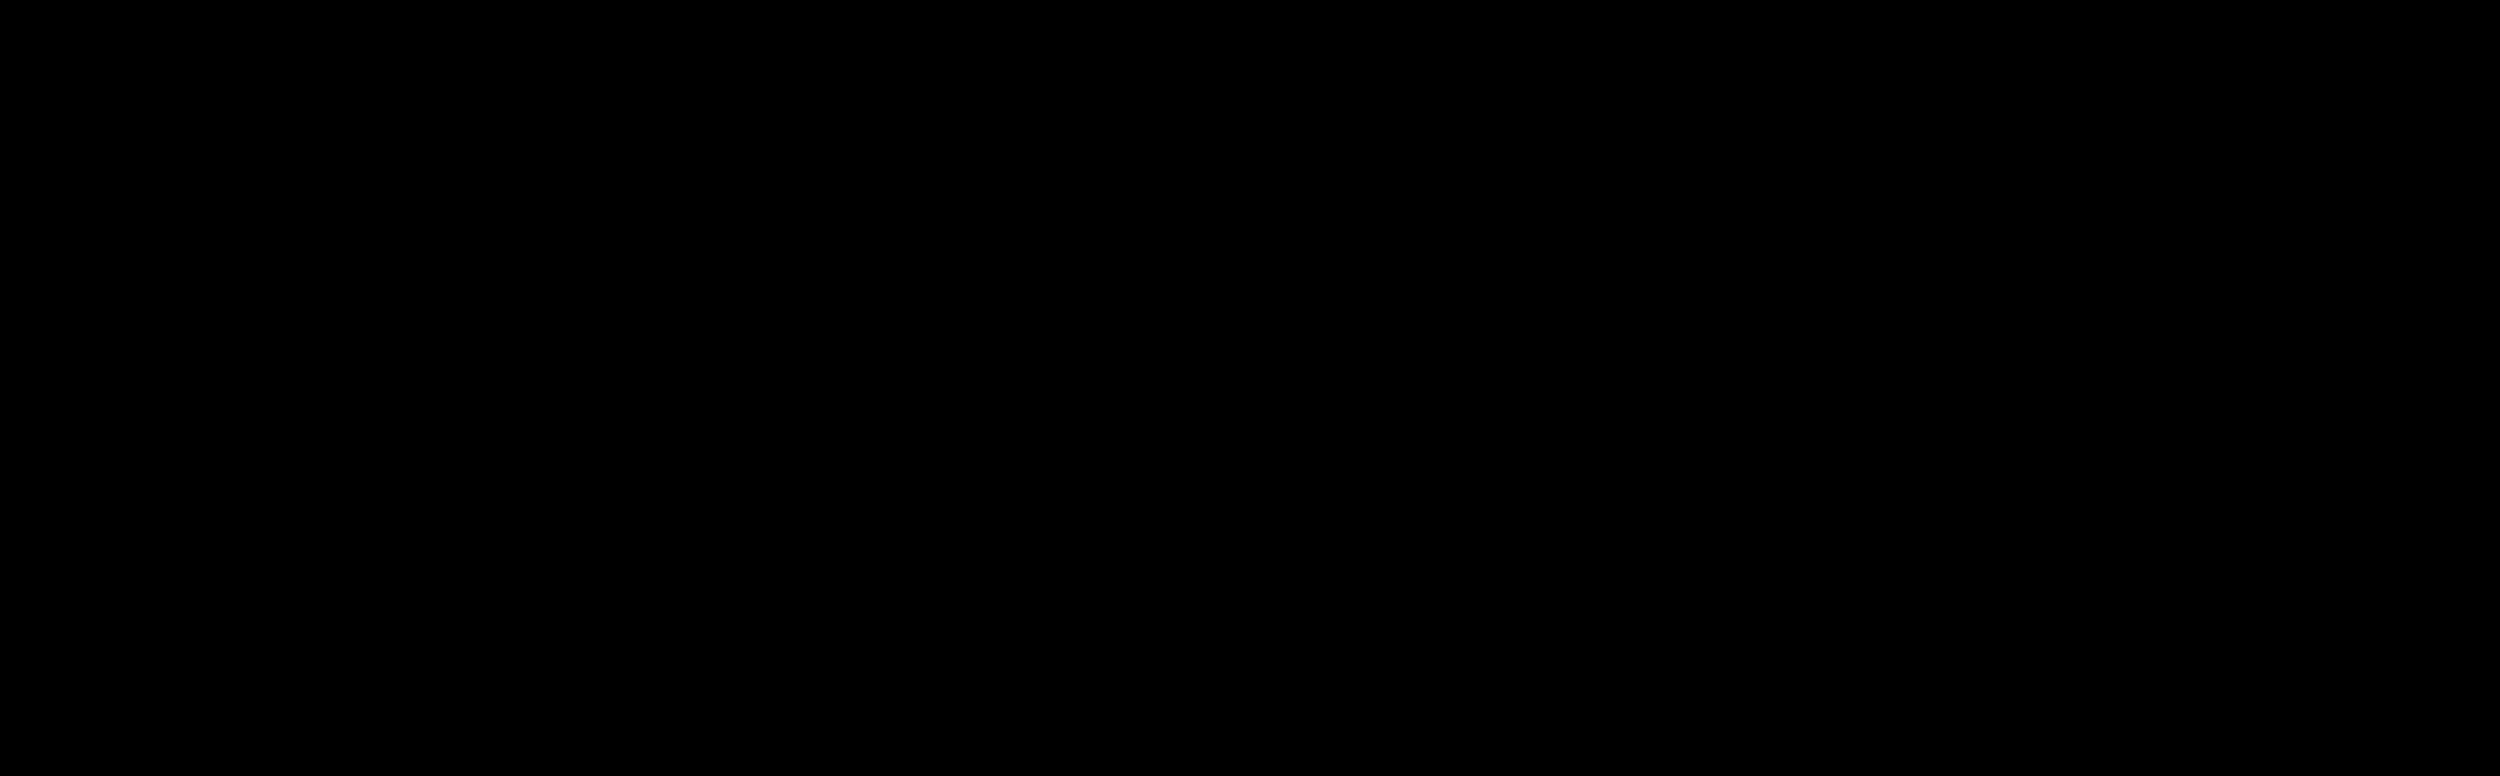 LogoBlack-Transparent.png